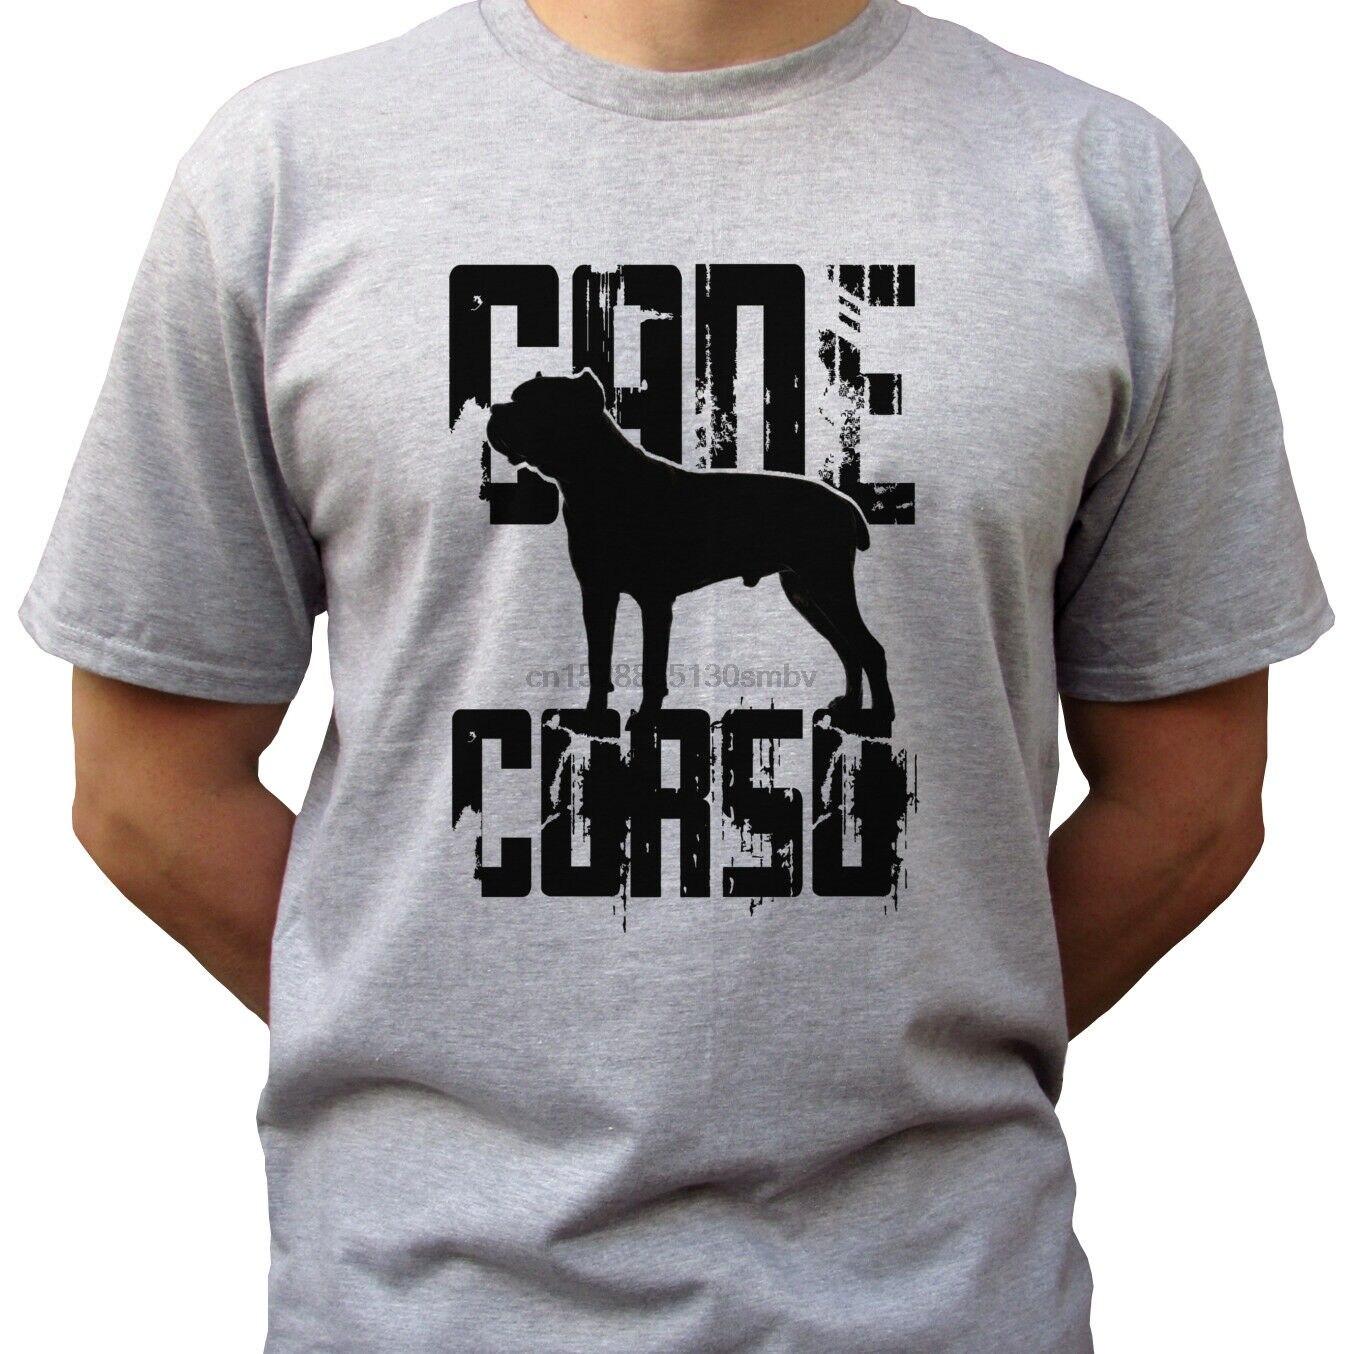 Cane Corso Logo-szary T Shirt koszulka motyw psa-męskie rozmiary